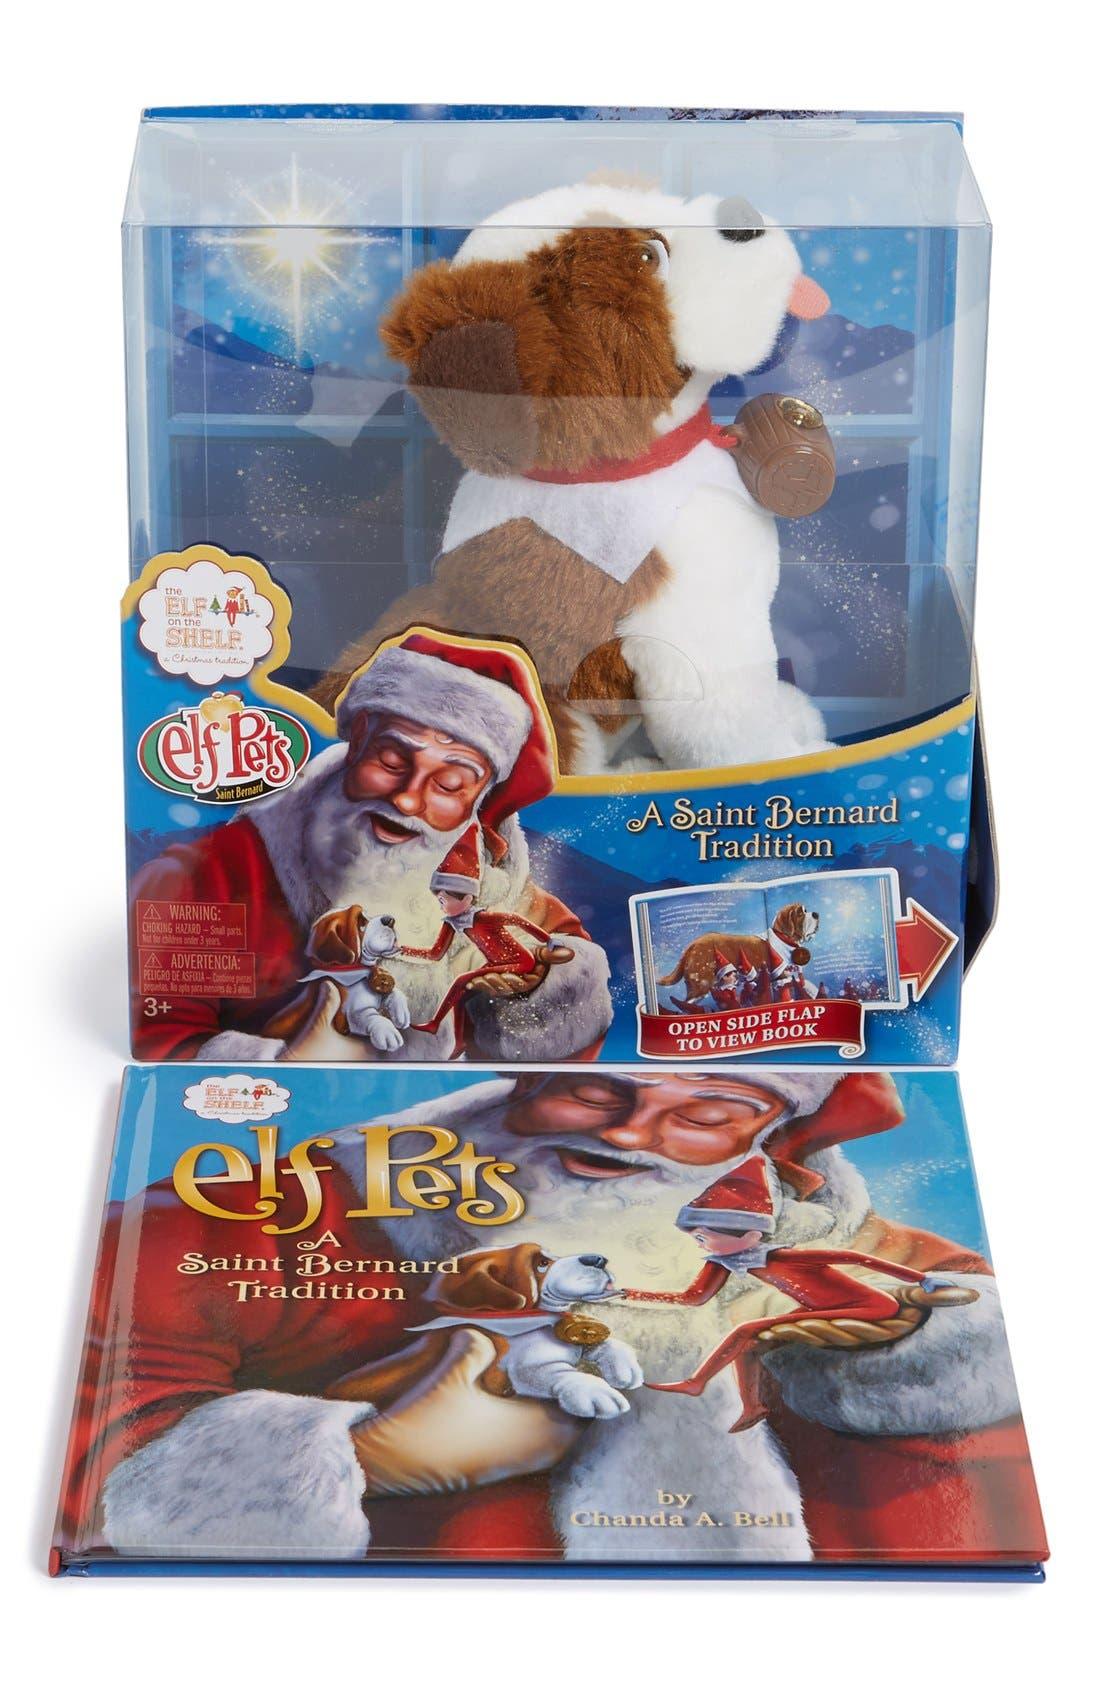 Toddler Elf On The Shelf Elf Pets A Saint Bernard Tradition Book  Stuffed Animal